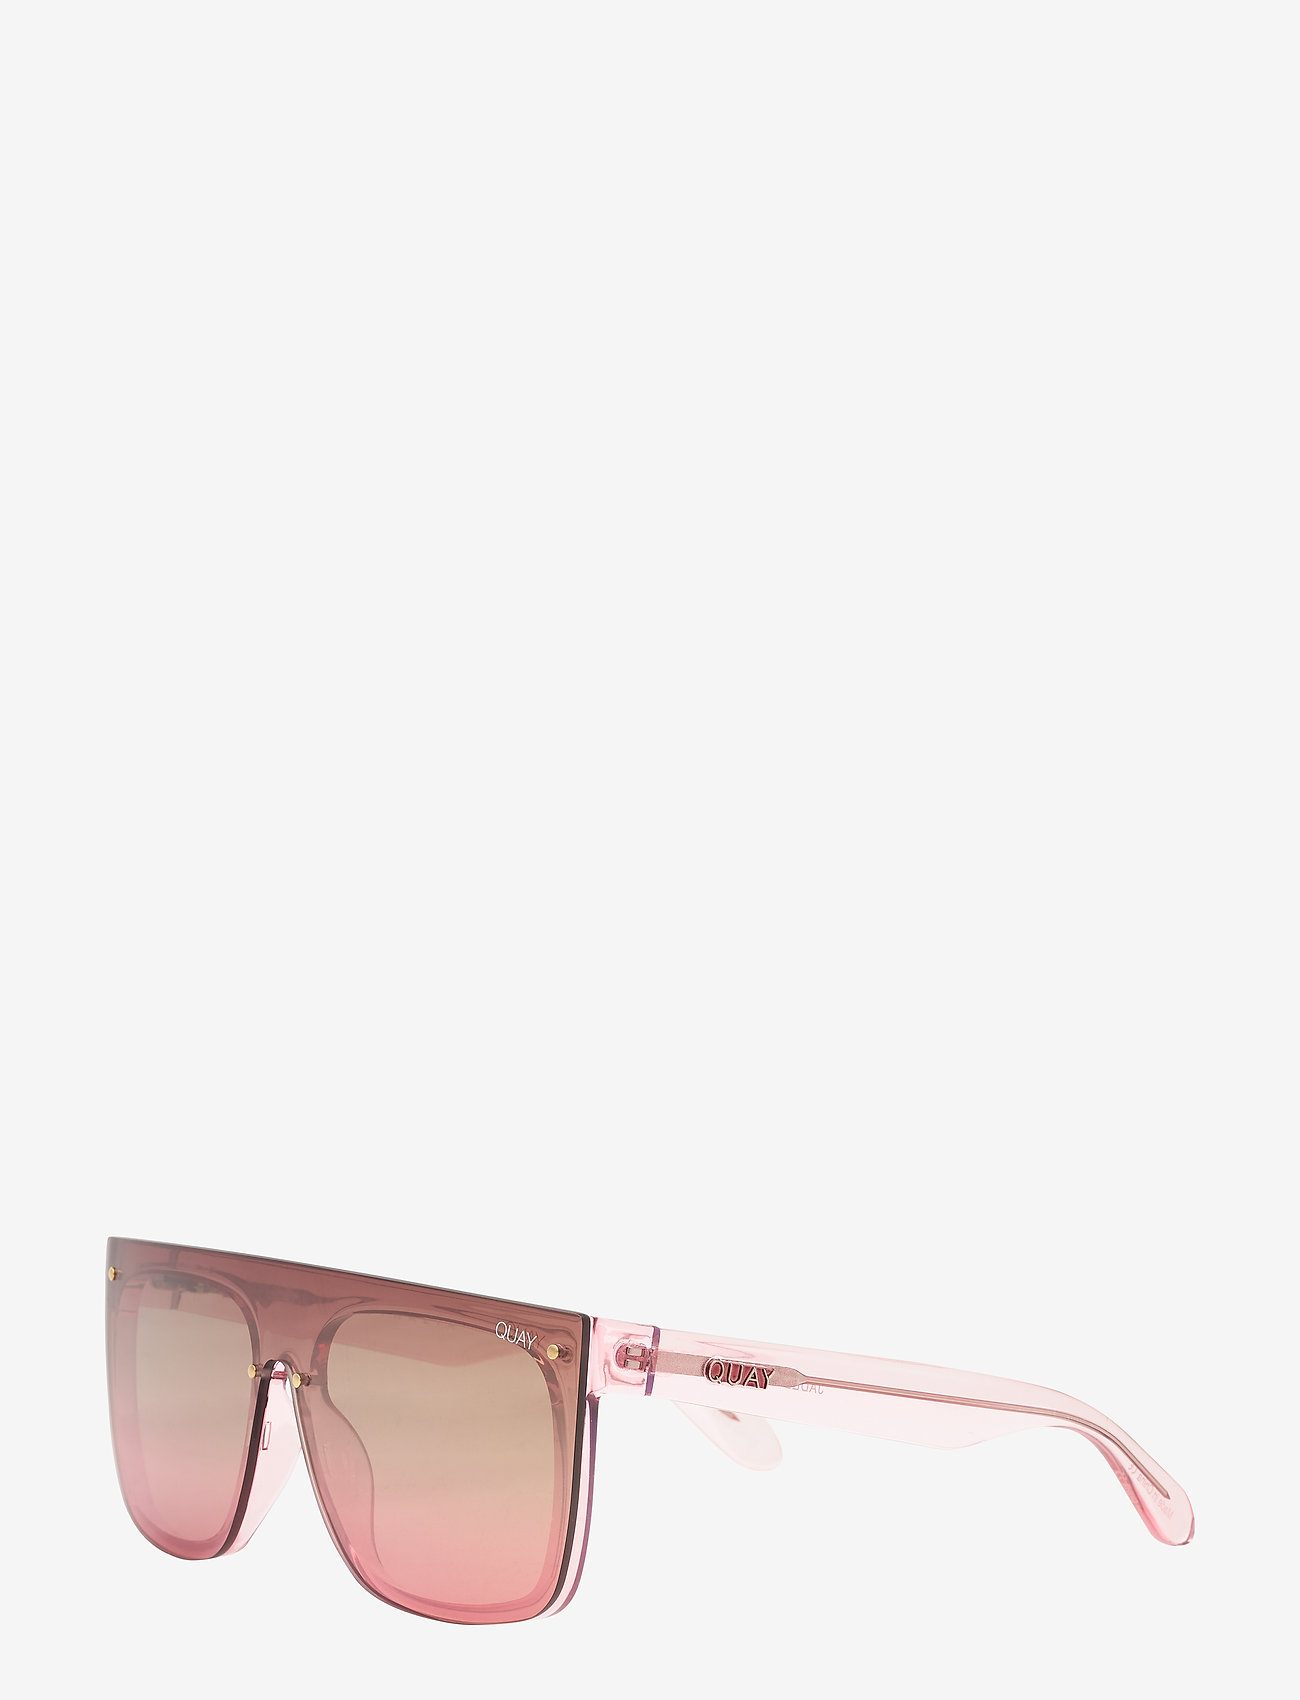 QUAY AUSTRALIA - JADED - d-shaped - pink / brown pink flash - 1